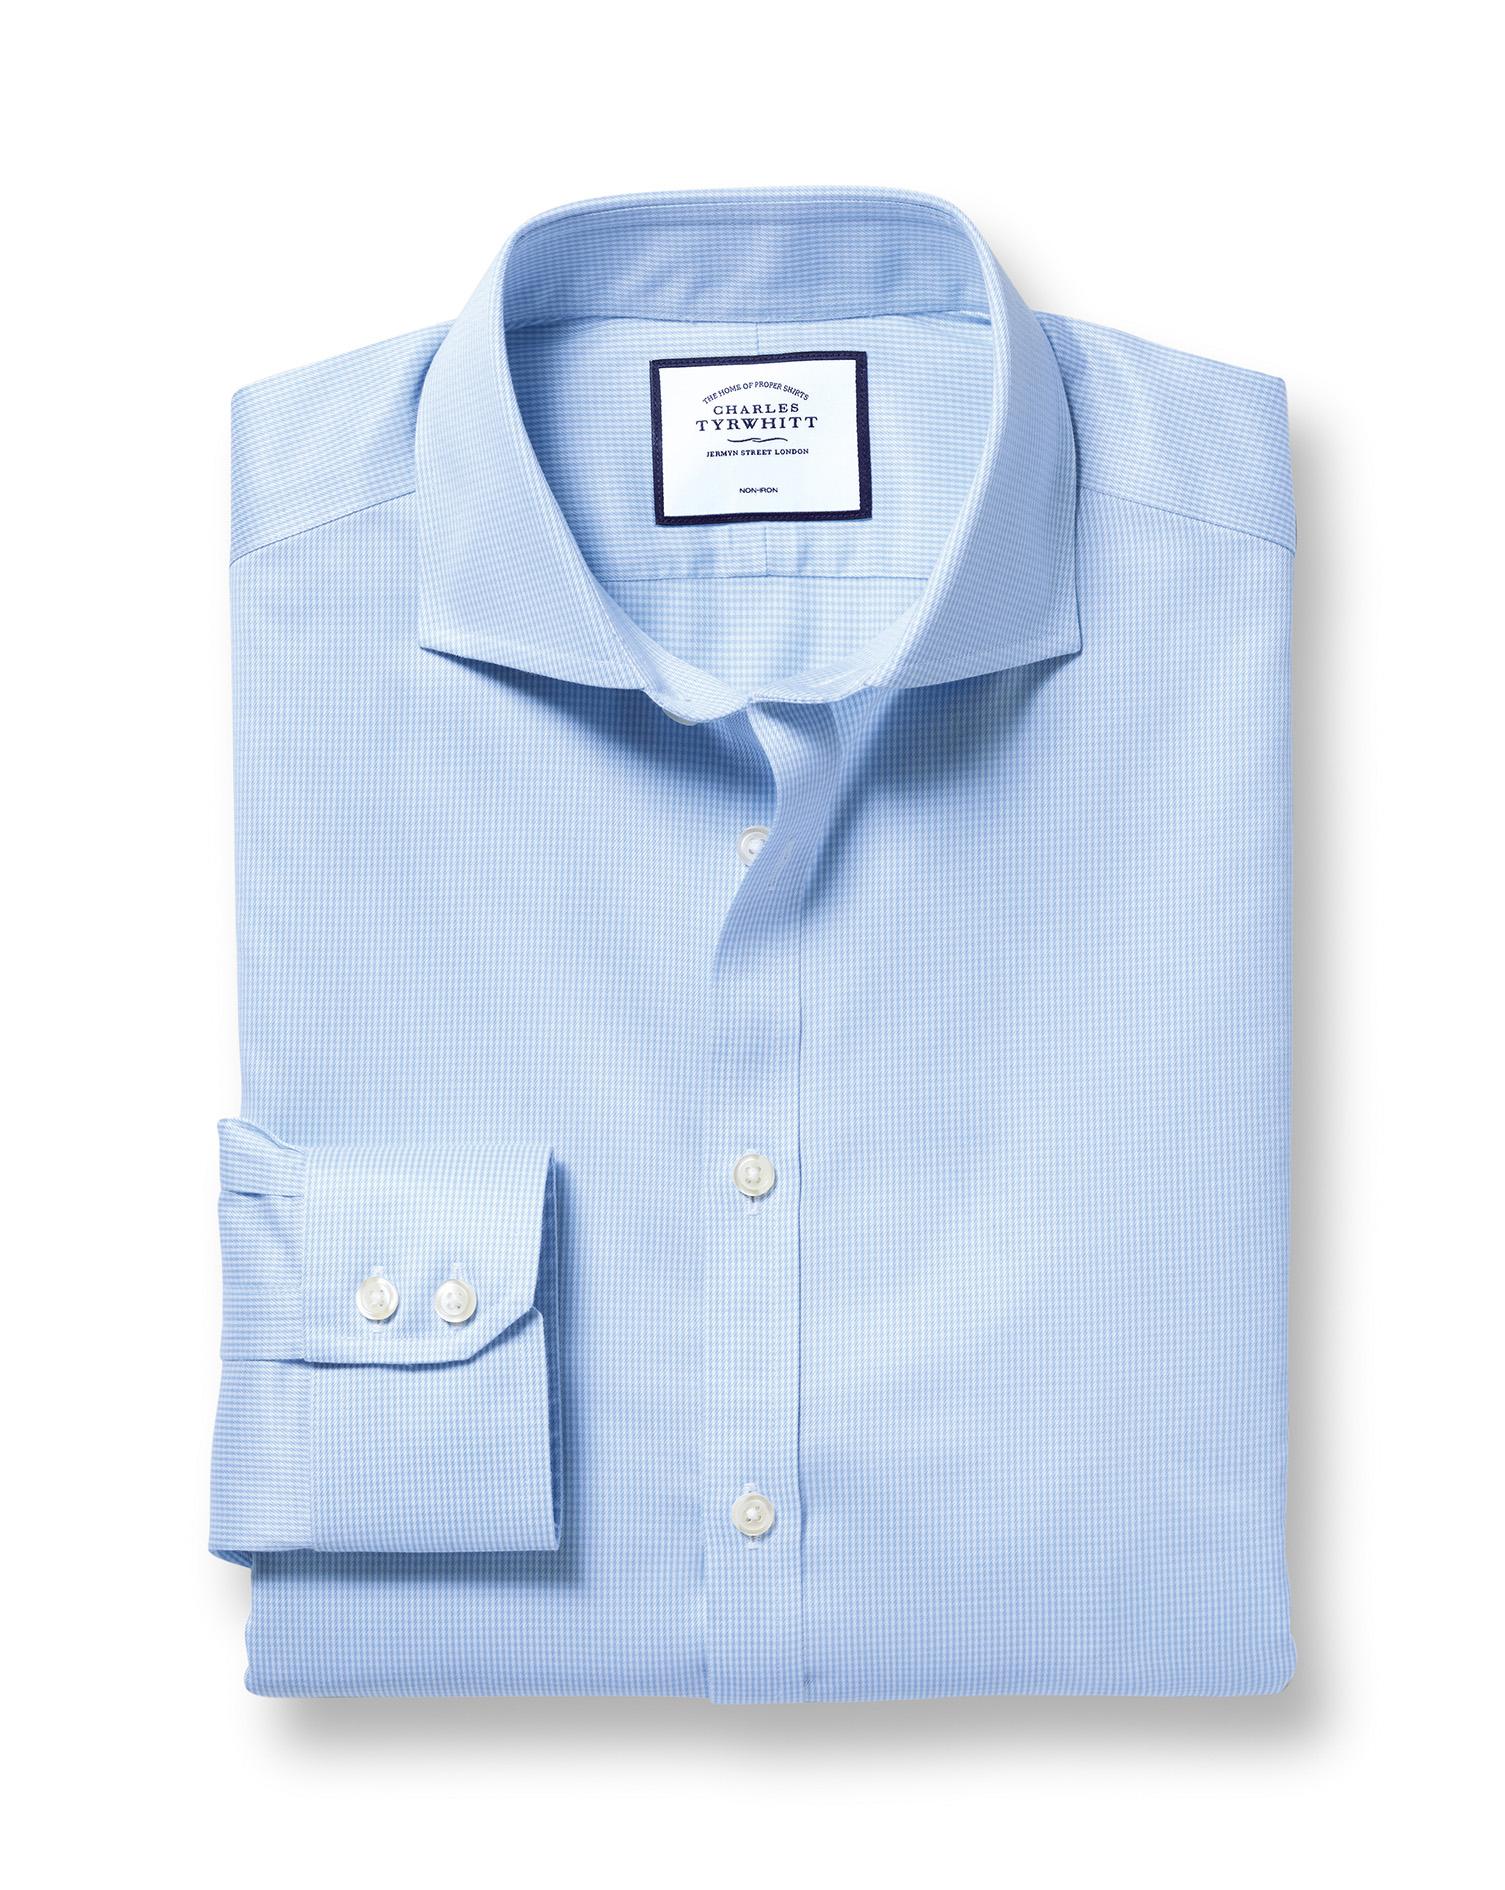 Cotton Extra Slim Fit Non-Iron Cutaway Sky Blue Puppytooth Shirt